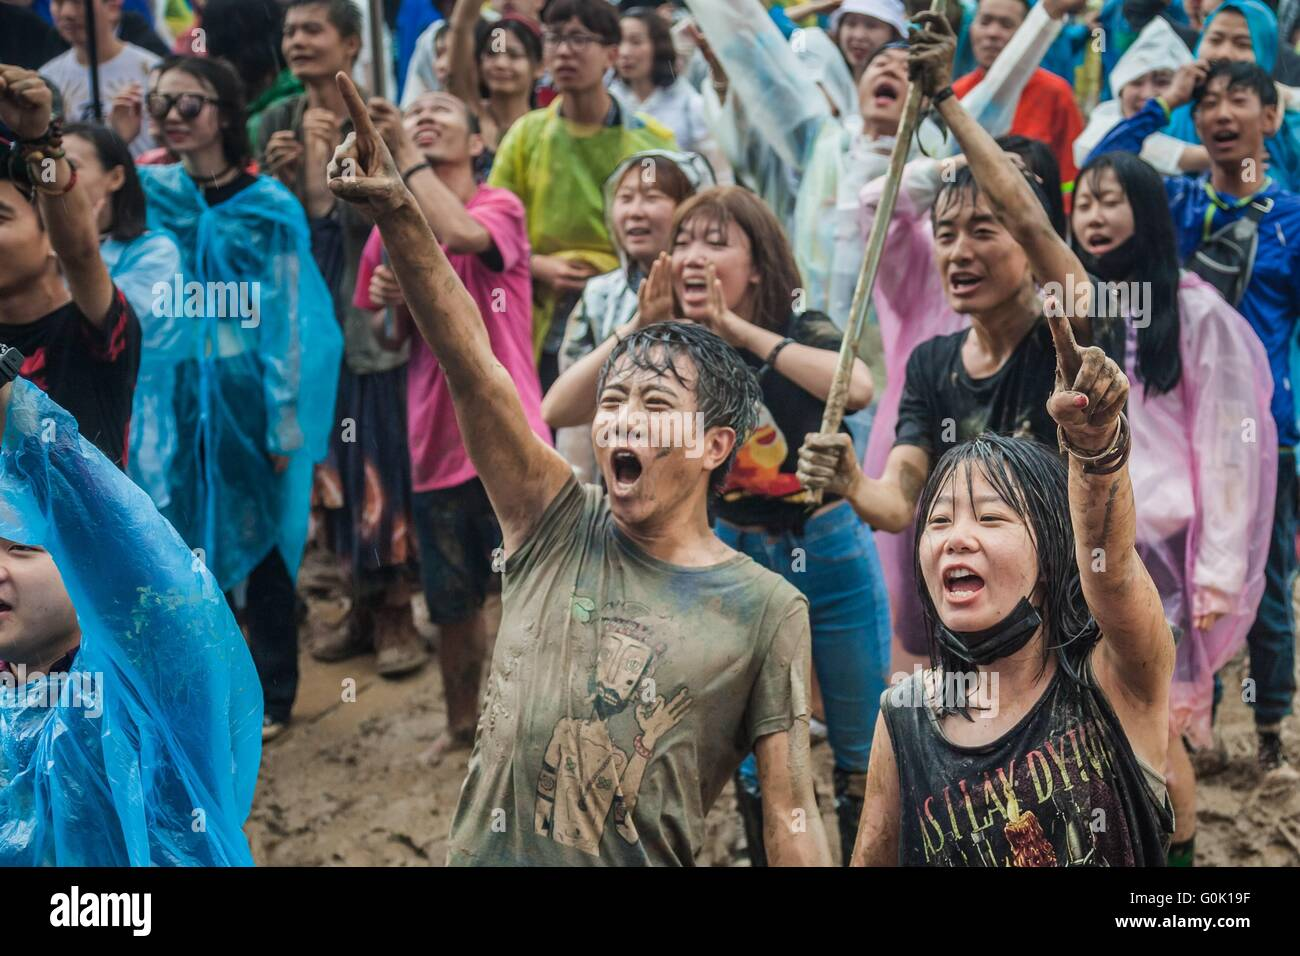 Suzhou, China Jiangsu Provinz. 2. Mai 2016. Musik-Fans jubeln am Taihu Midi Festival in Suzhou, der ostchinesischen Stockbild